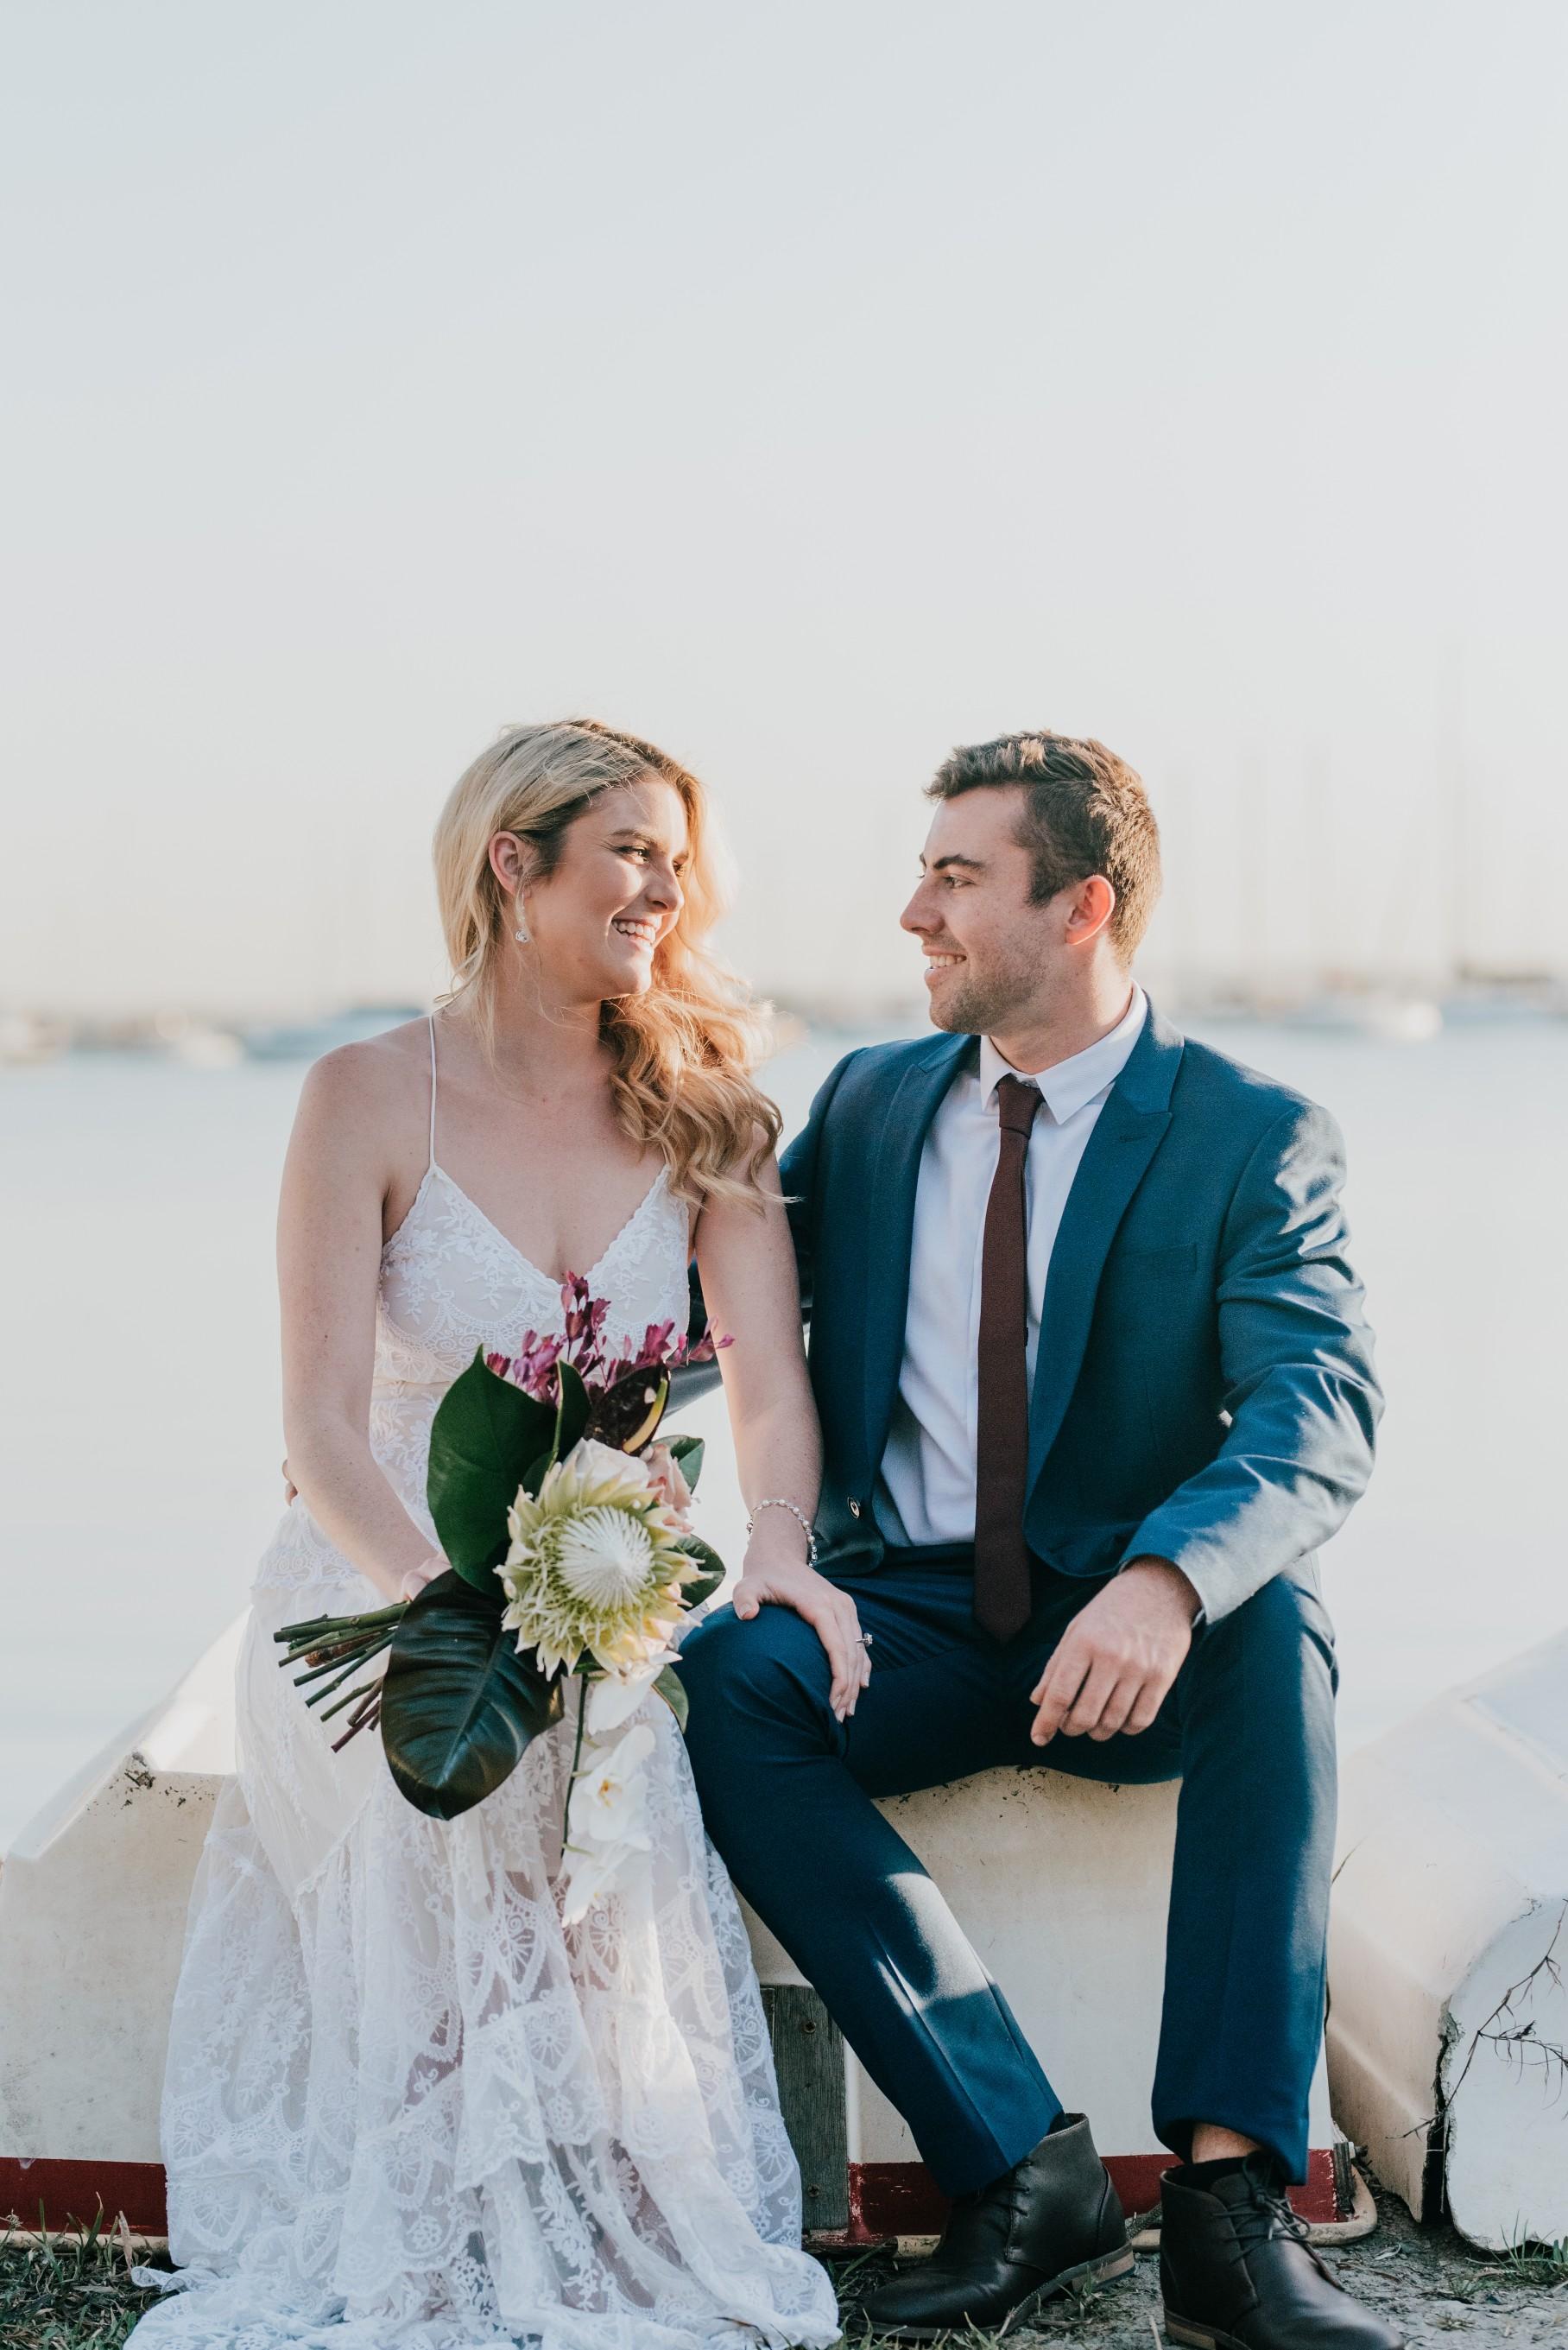 Gunyah Wedding _ Accommodation Photoshoot (18th July 2018) - Full Res-83.jpg